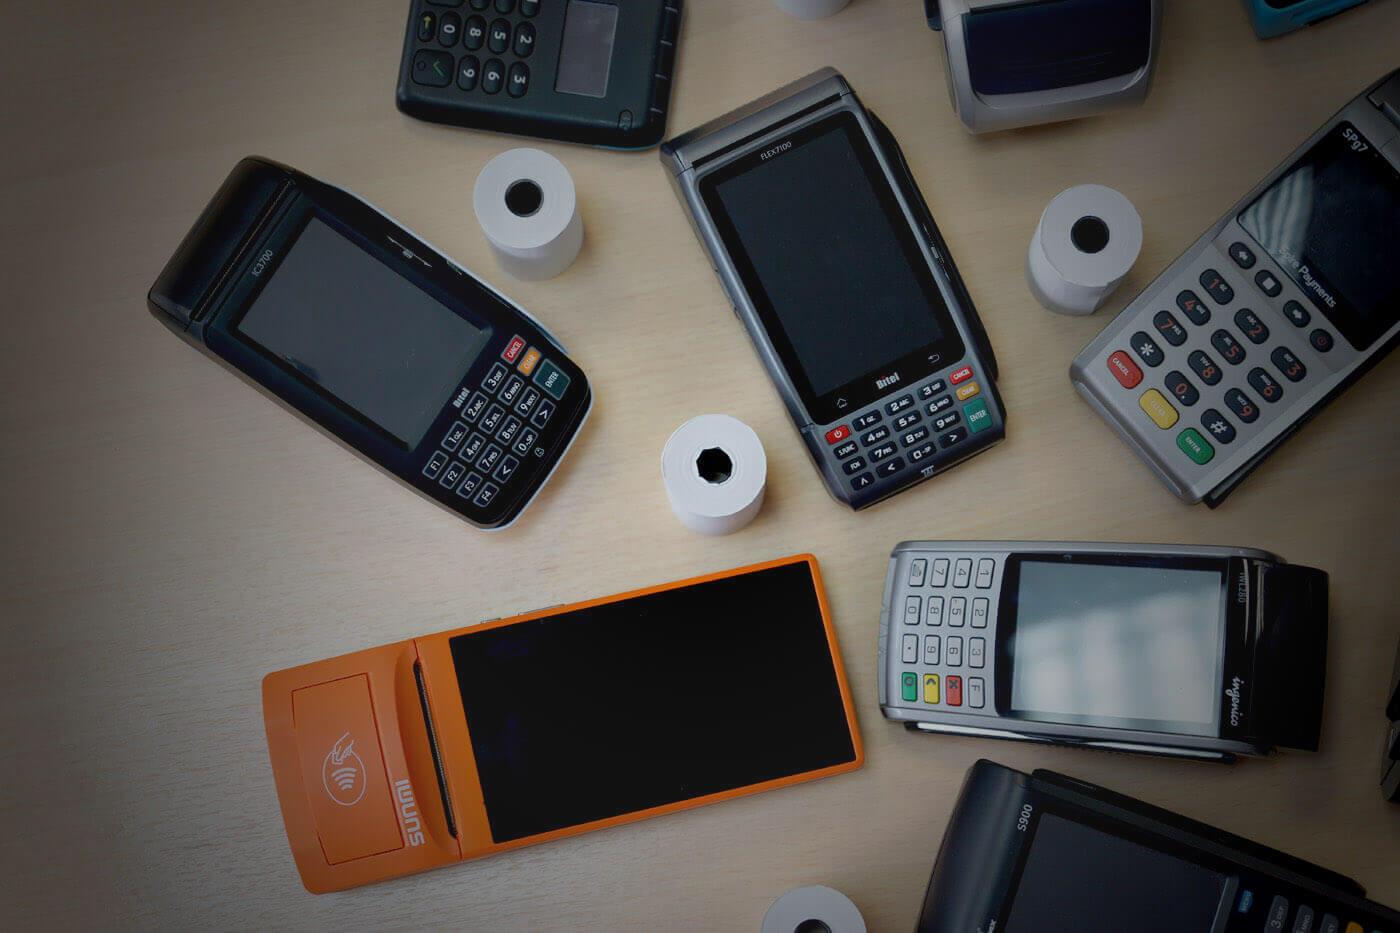 JoinPOS - cross-platform software for payment terminals